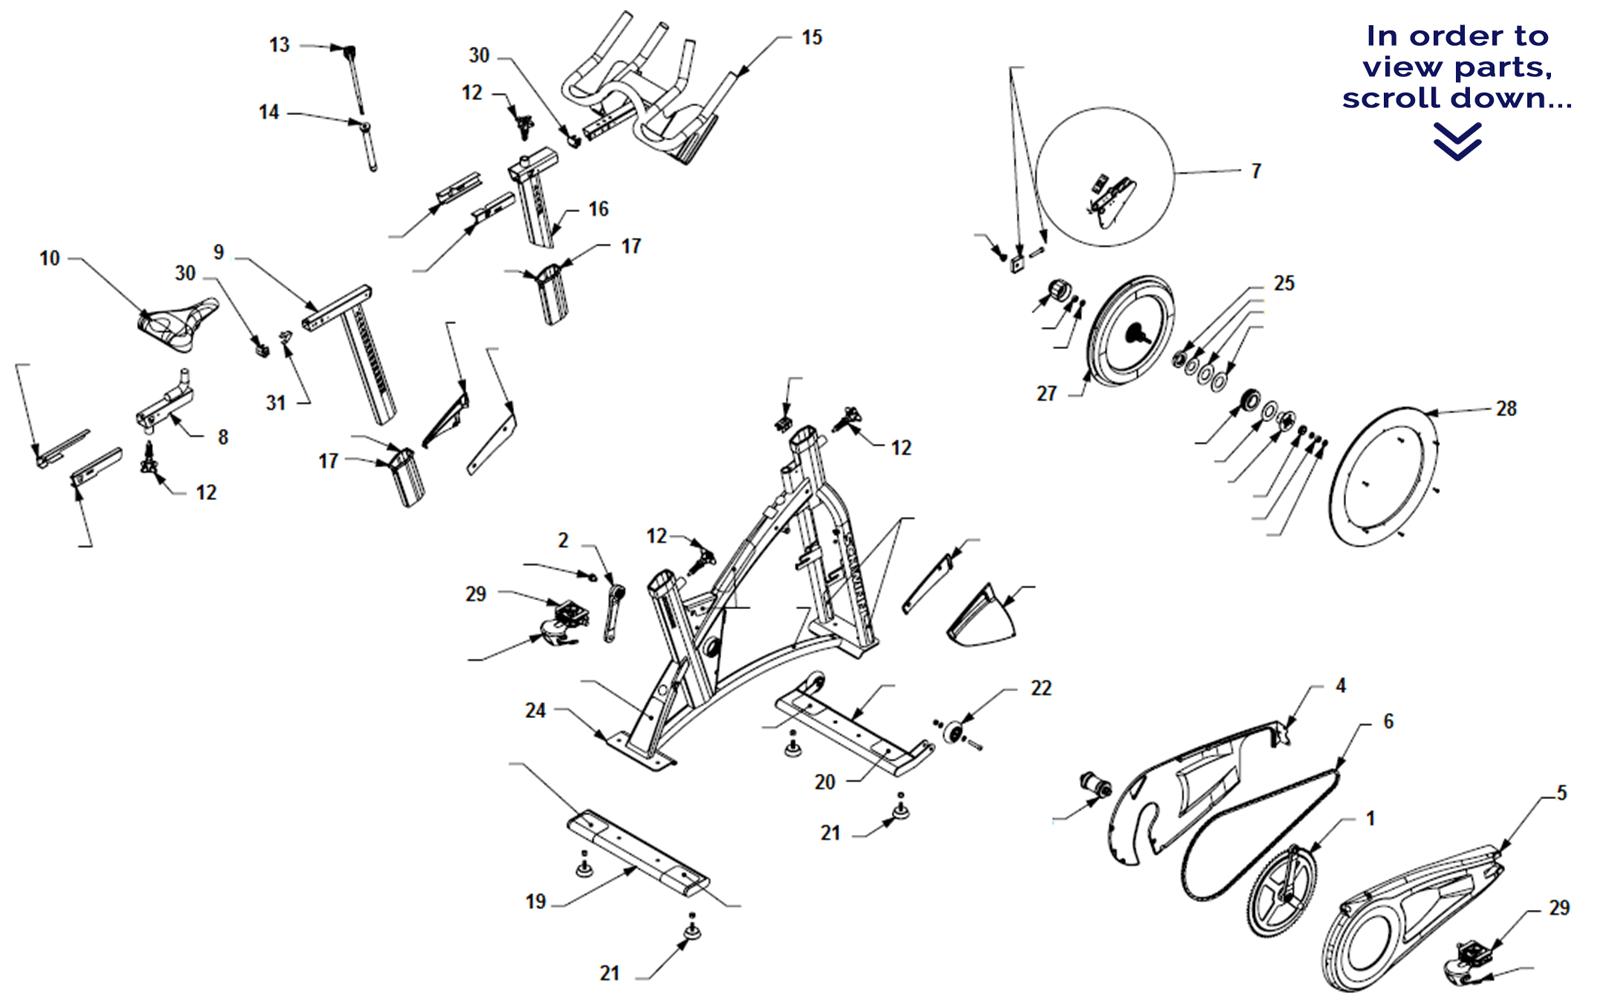 Schwinn AC Performance--Scroll down to view parts